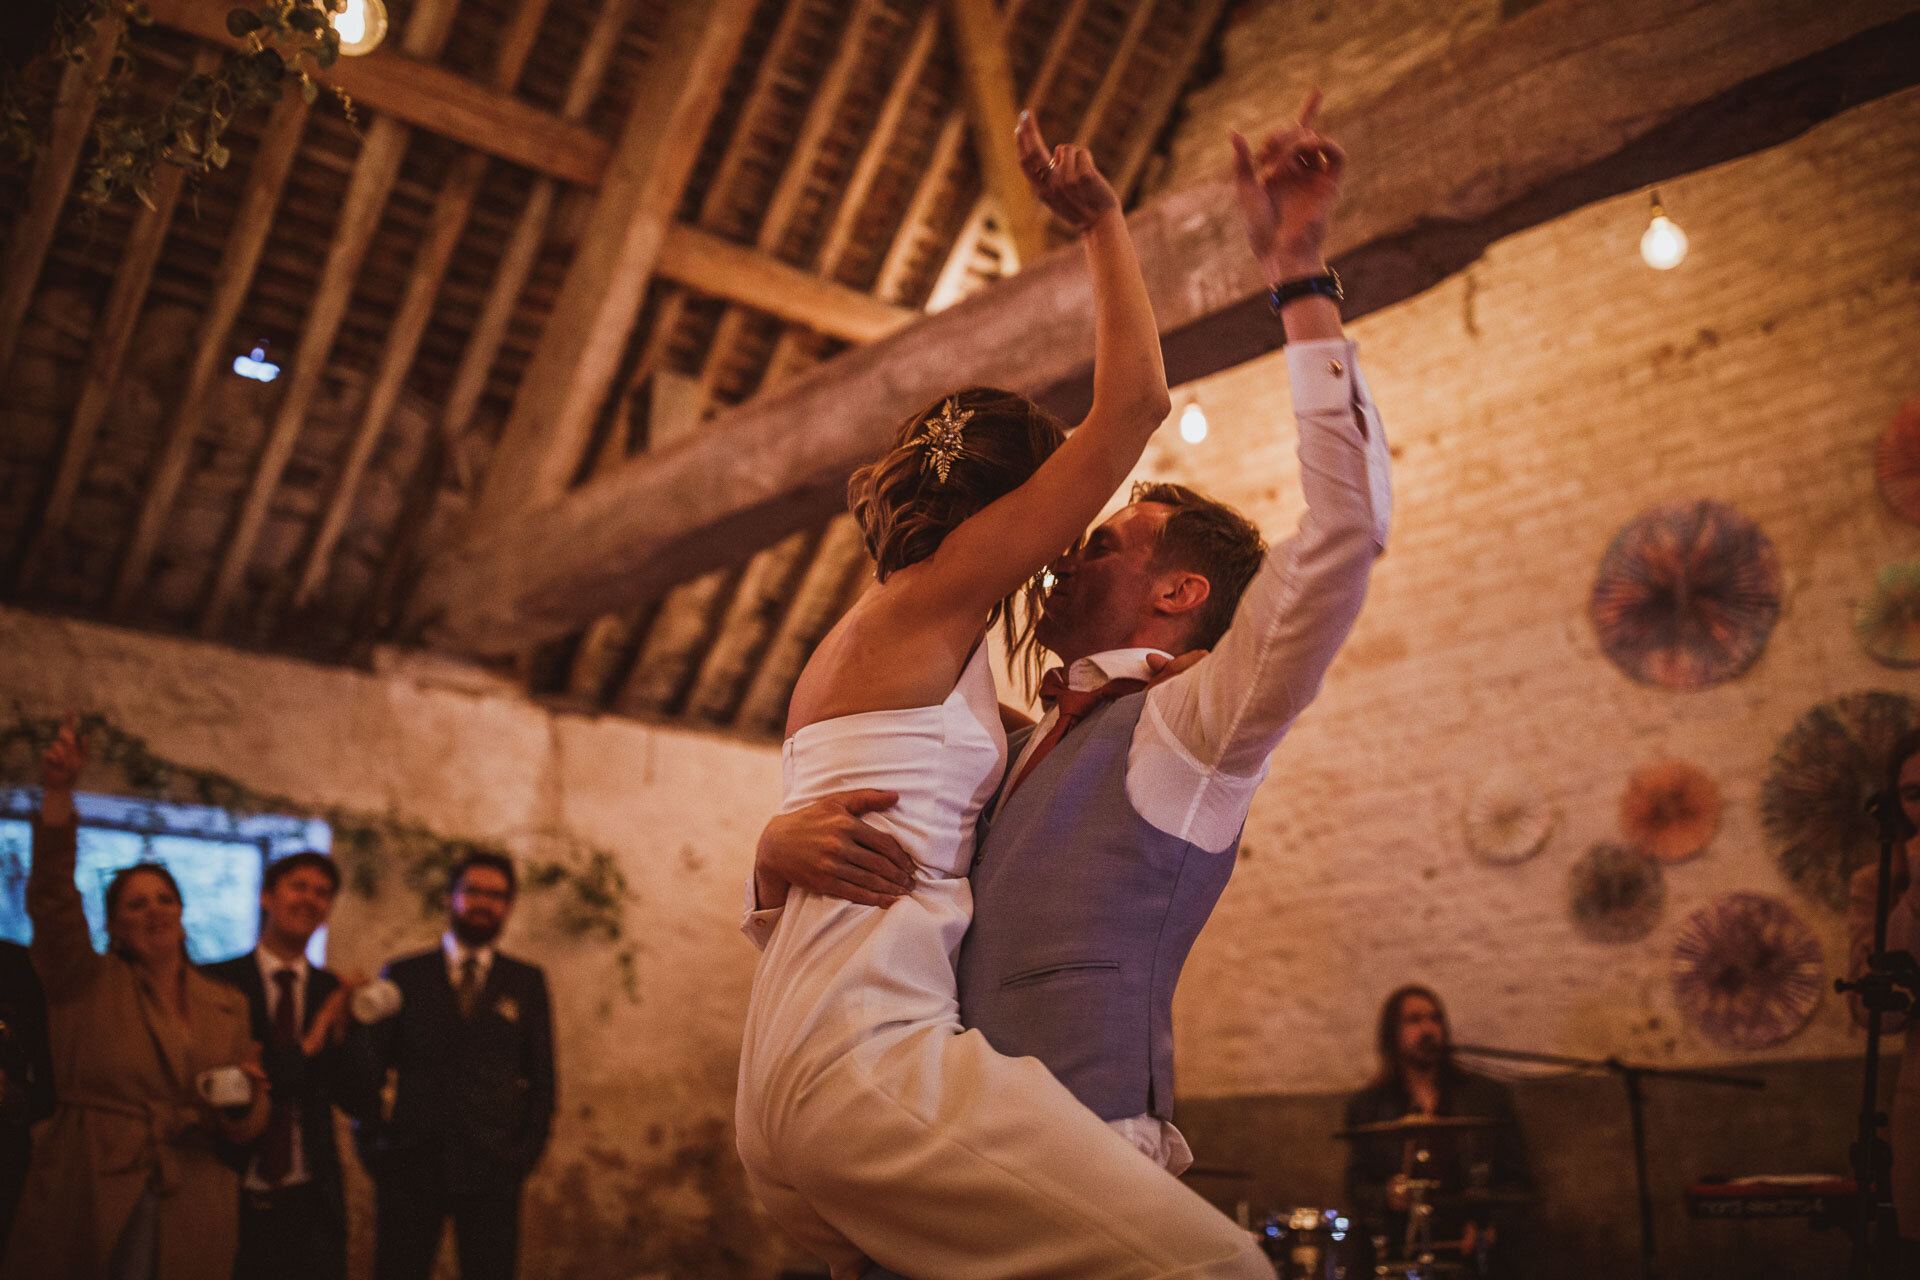 dorset_wedding_photographer-144.jpg